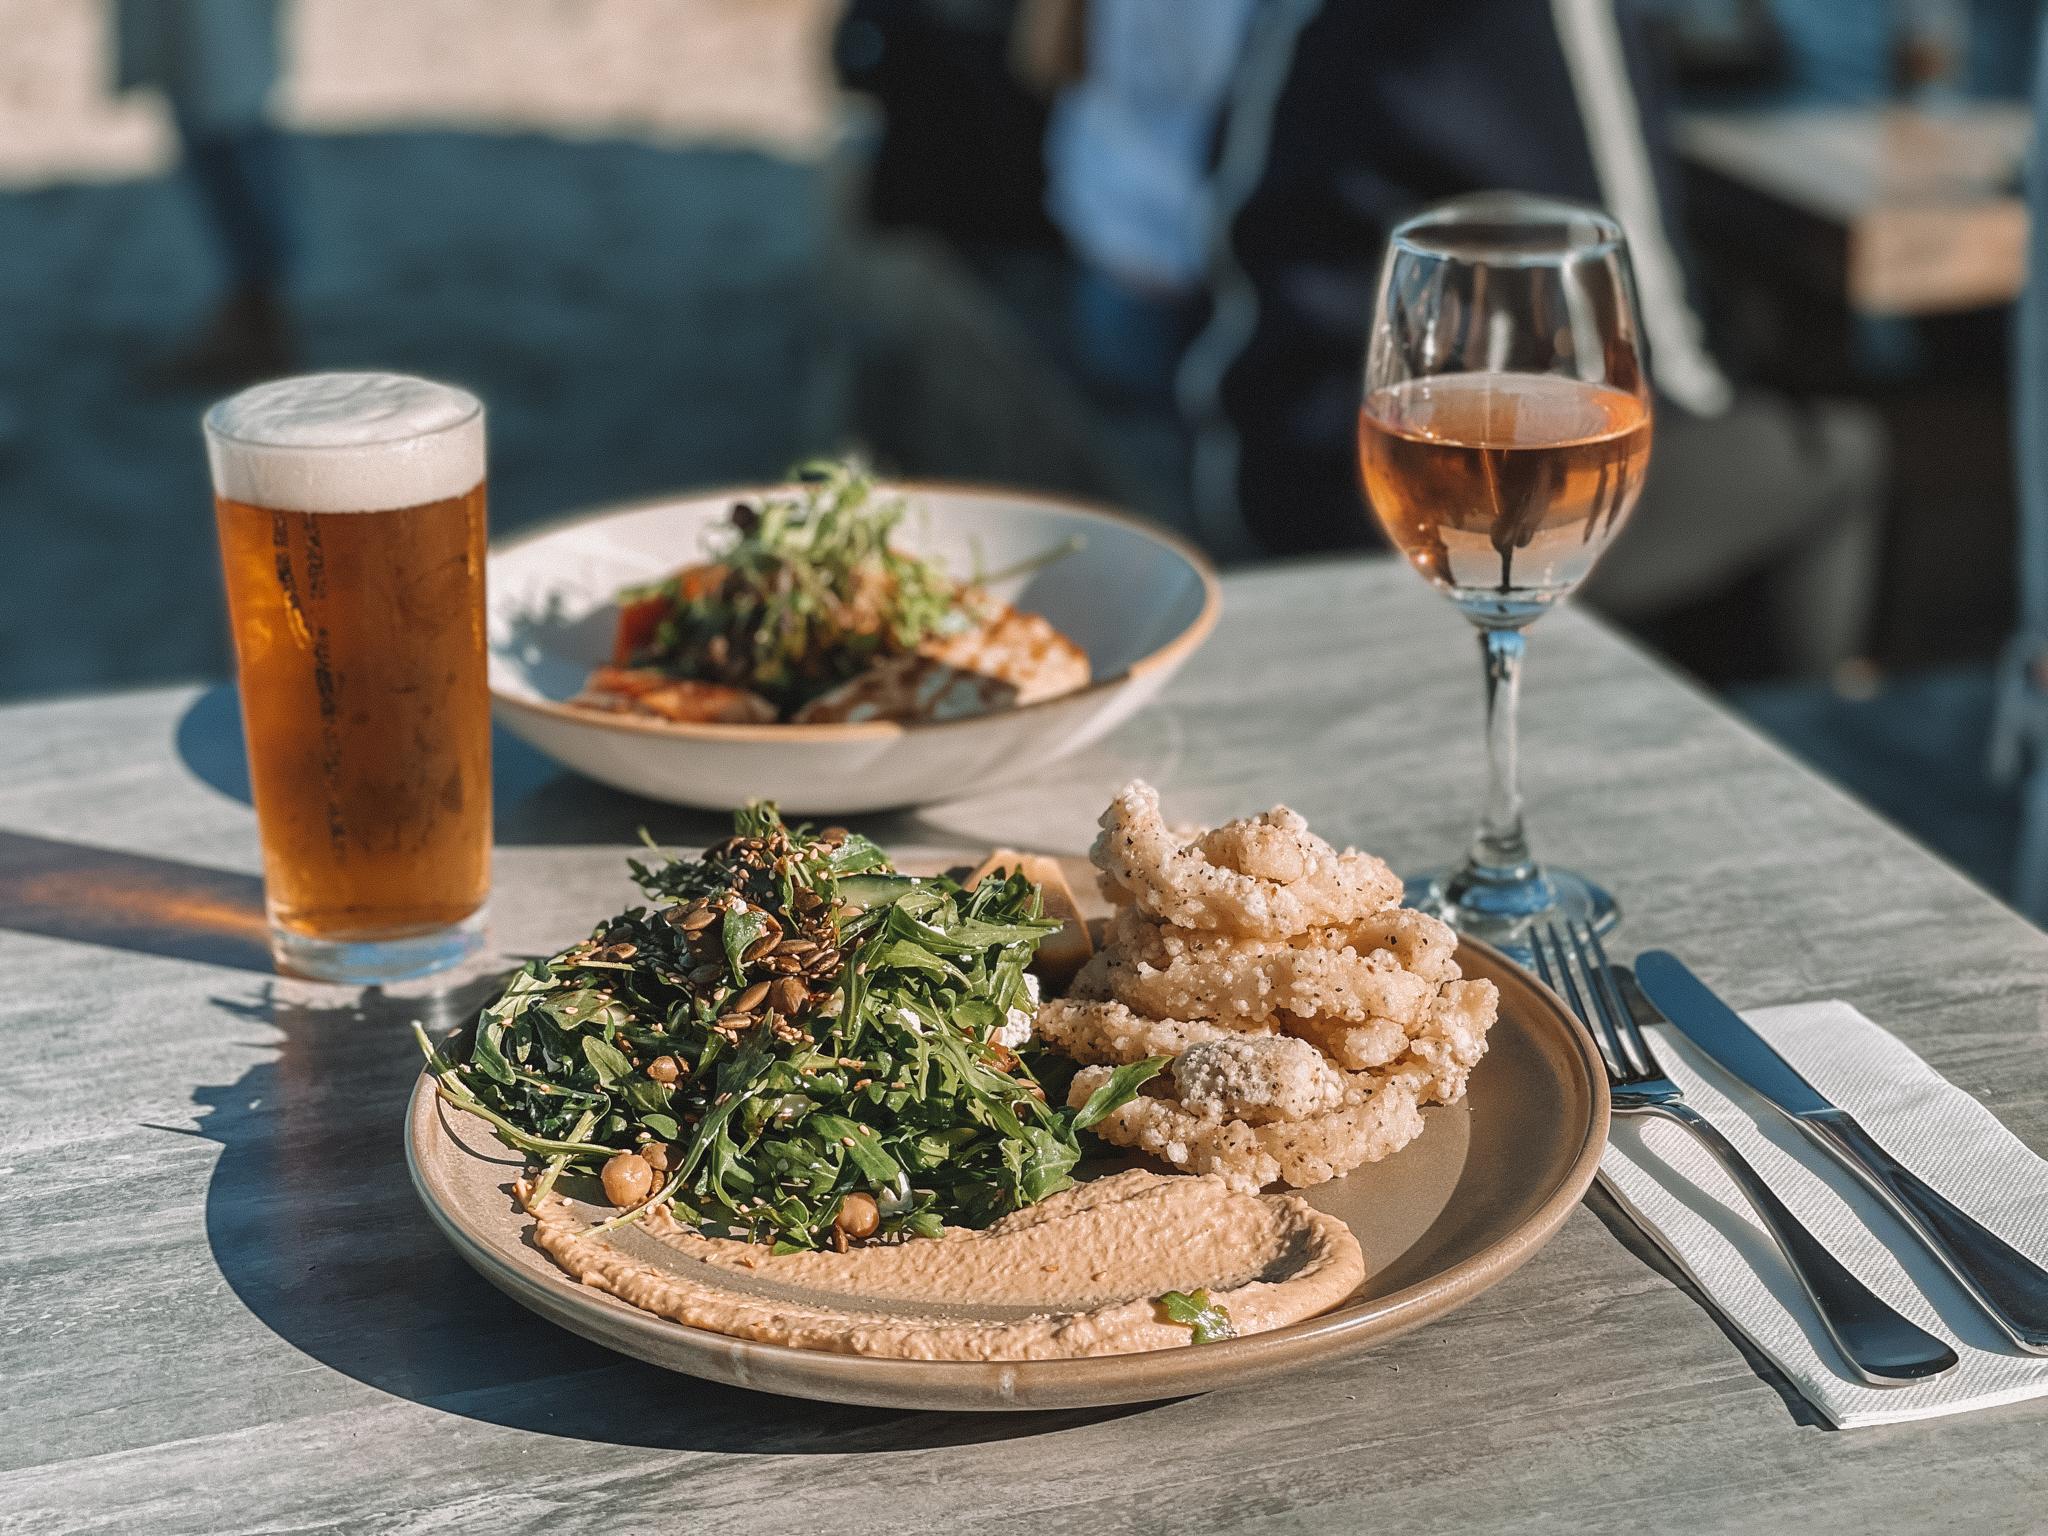 Calamari Lunch Option at The Sandbar